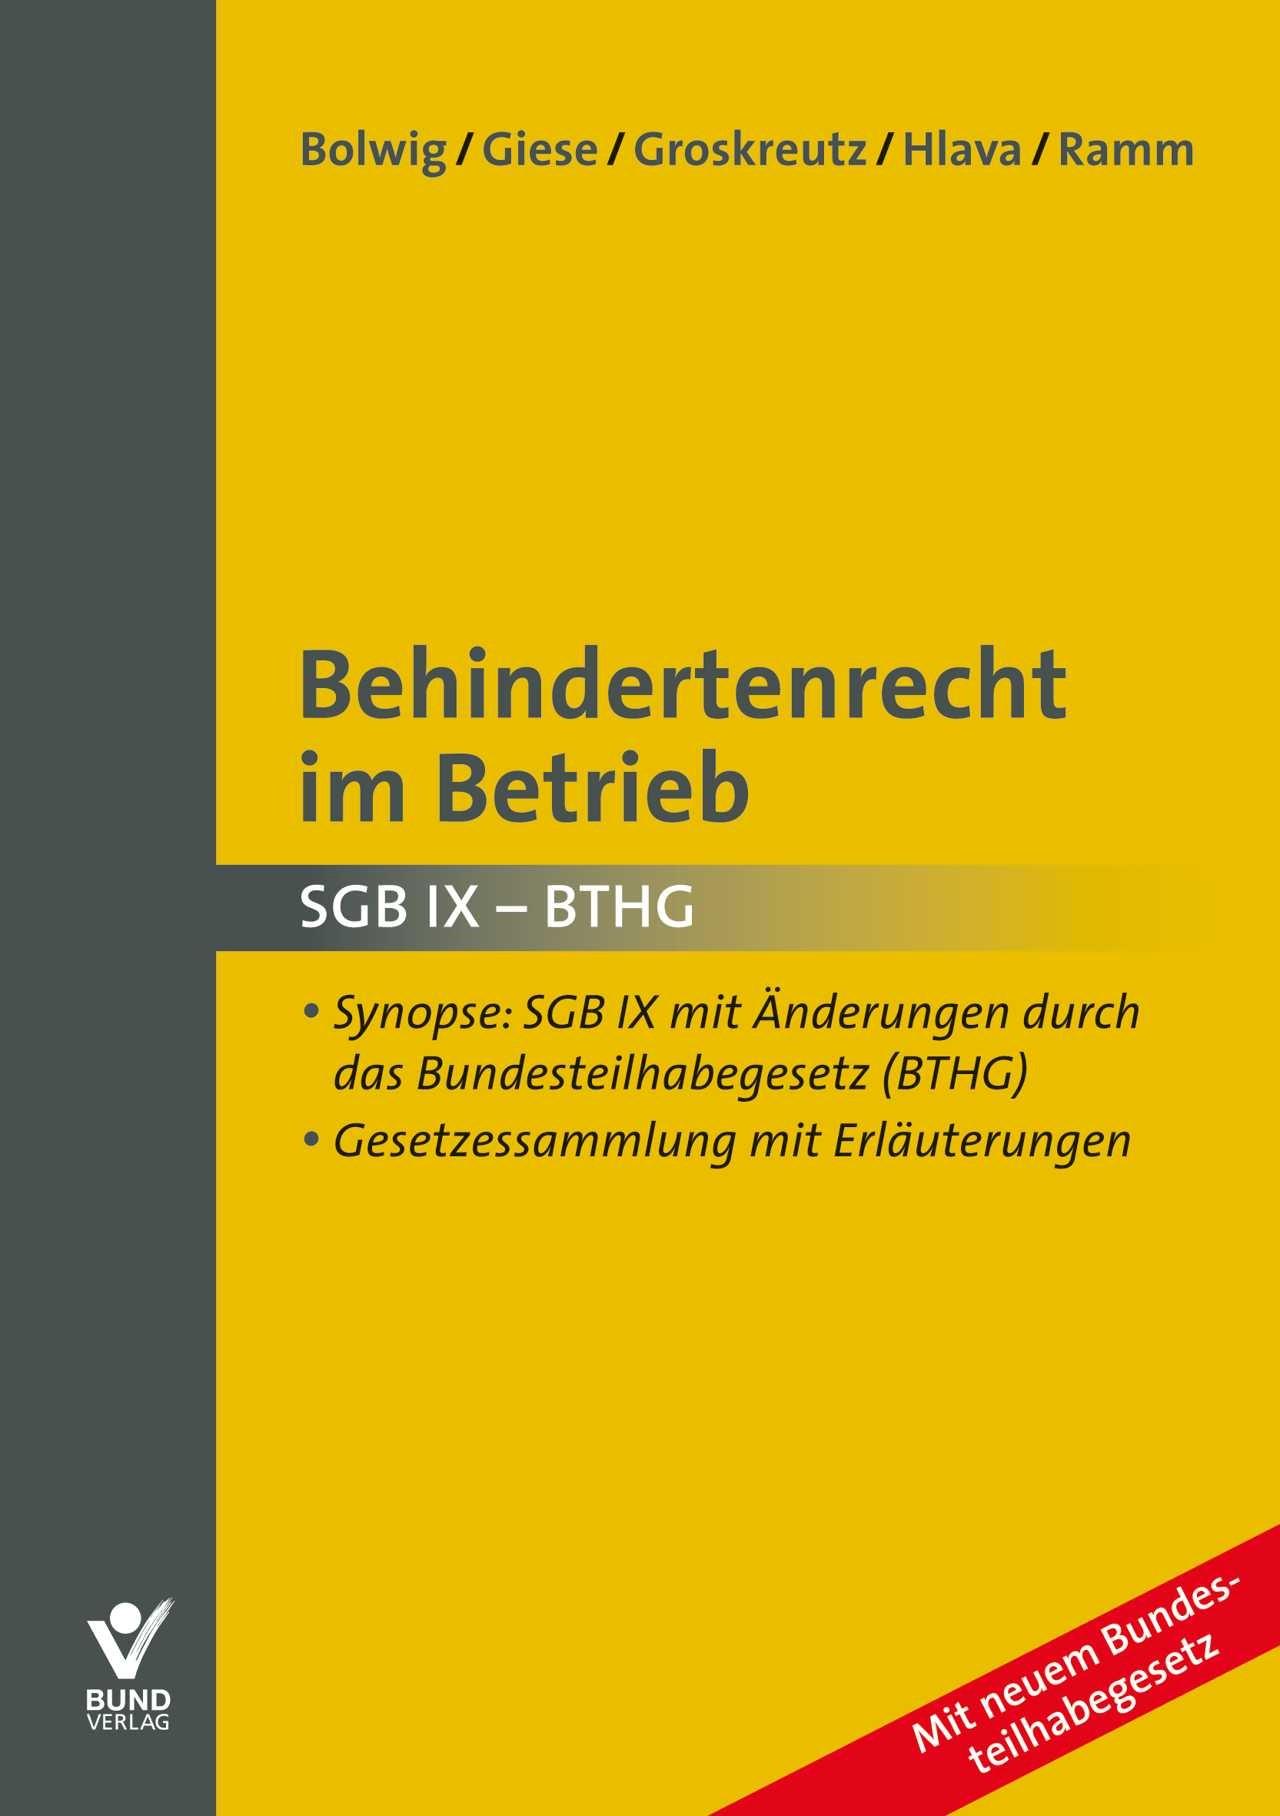 Behindertenrecht im Betrieb | Bolwig / Giese / Groskreutz / Hlava / Ramm, 2017 | Buch (Cover)